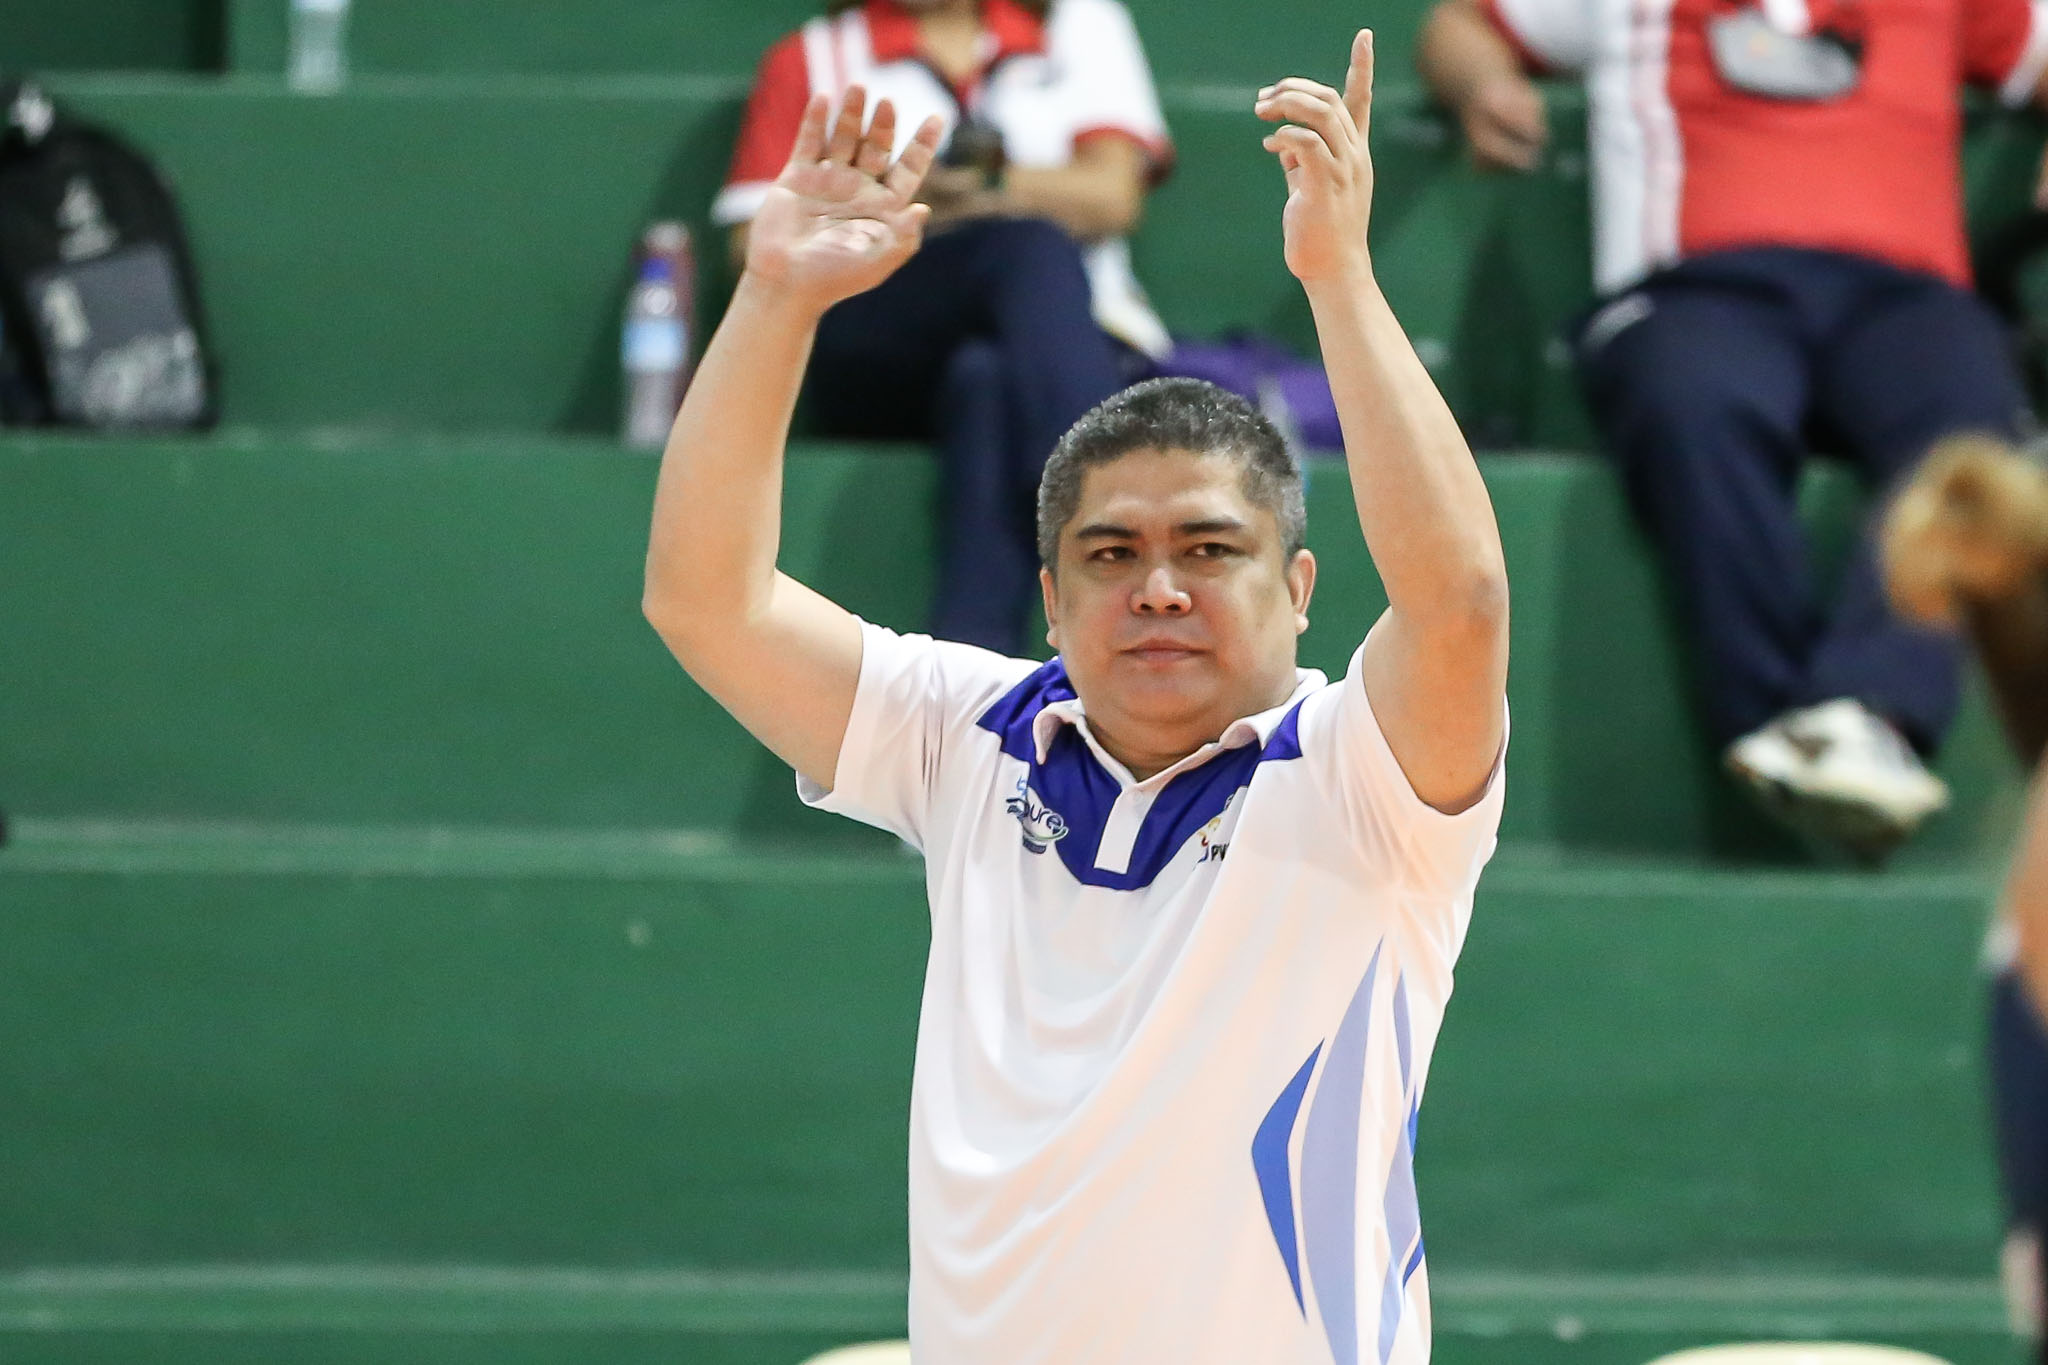 2021-PVL-Open-BaliPure-vs-Chery-Tiggo-Rommel-Abella Win over Chery Tiggo proves that BaliPure can shock PVL, says Bombita News PVL Volleyball  - philippine sports news